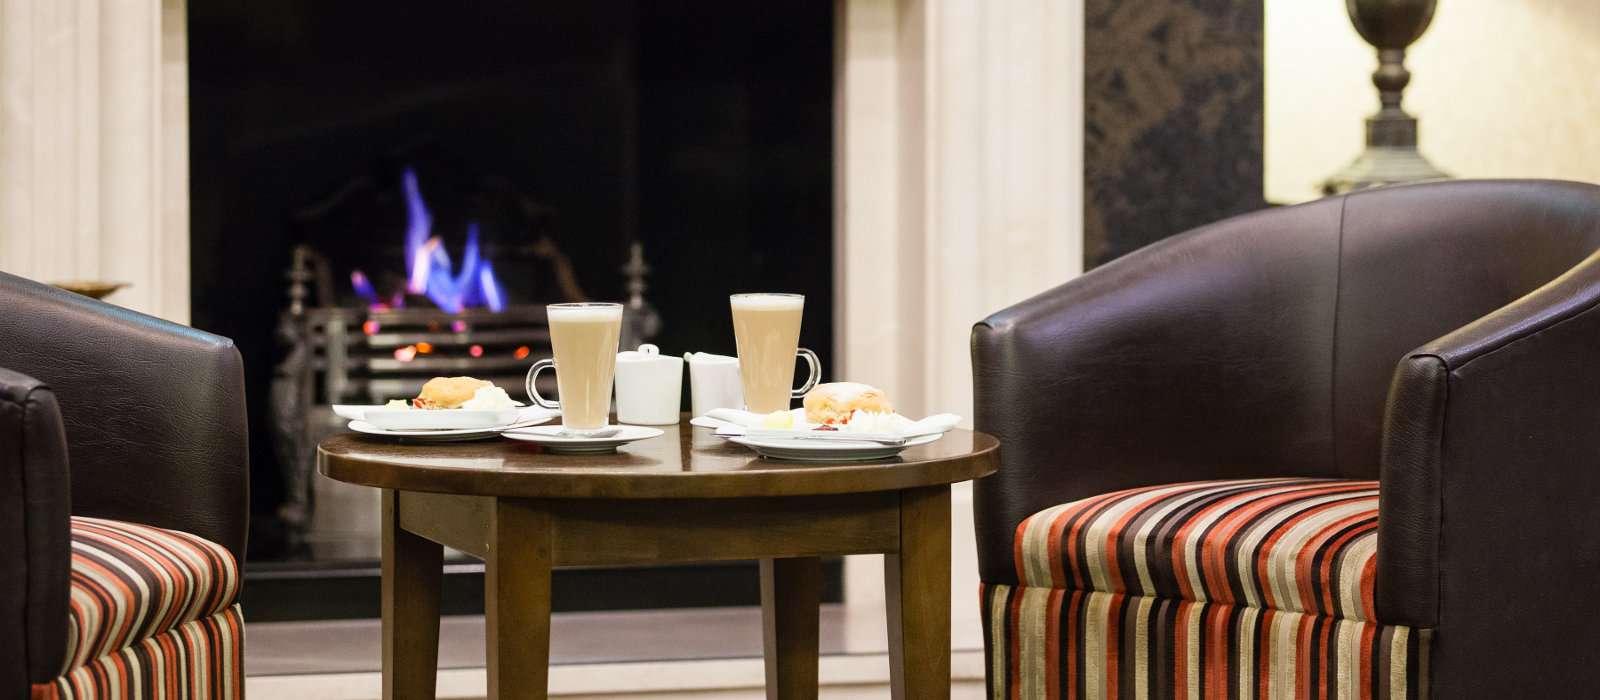 Coffee & Scones at the Lodge Hotel Coleraine